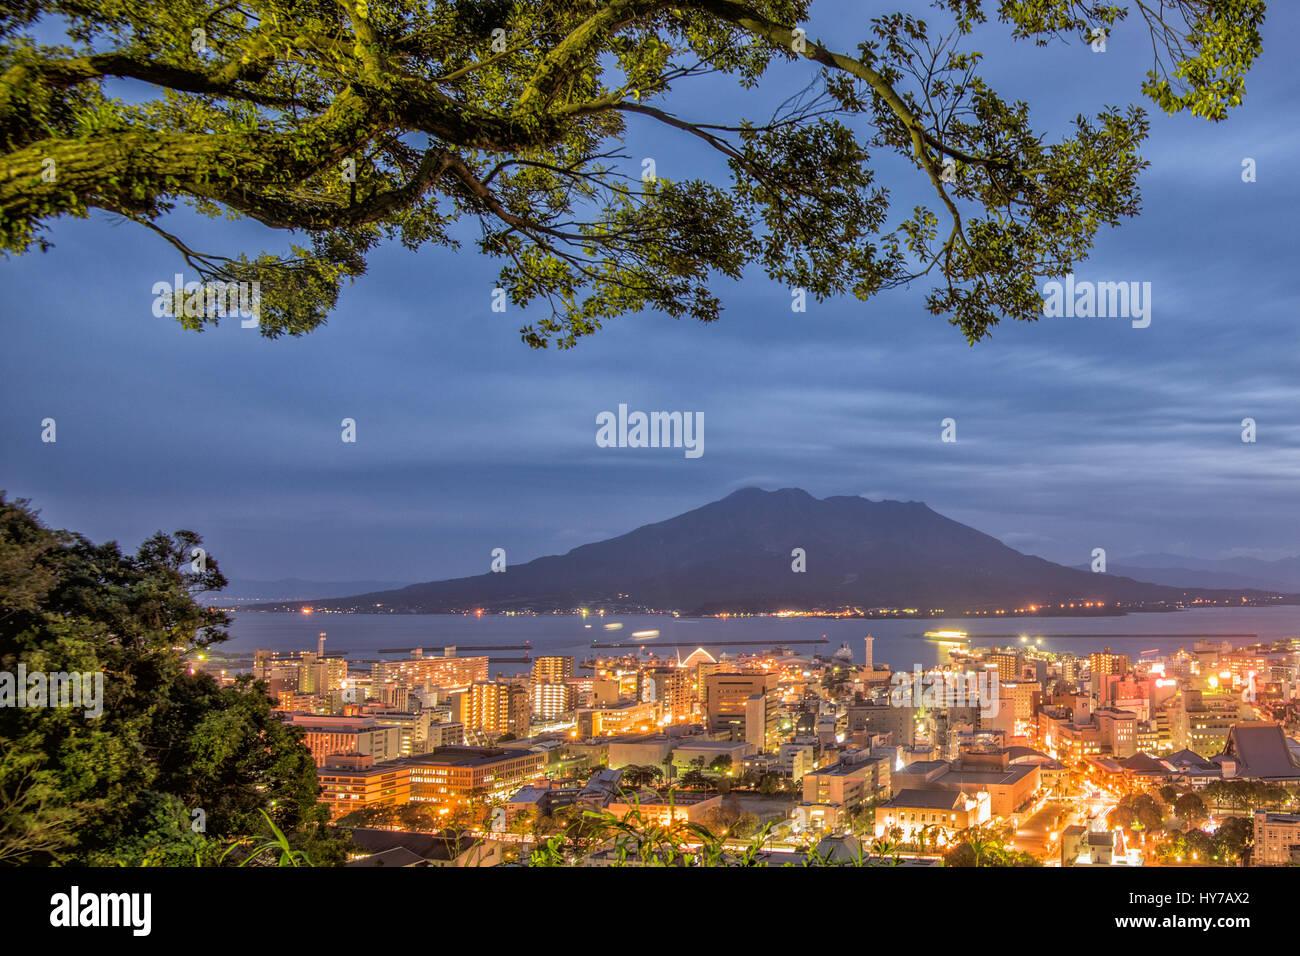 Twilight Sakurajima Volcano and Kagoshima City View from Shiroyama Viewpoint, Yakushima Island, Kyushu, Japan - Stock Image